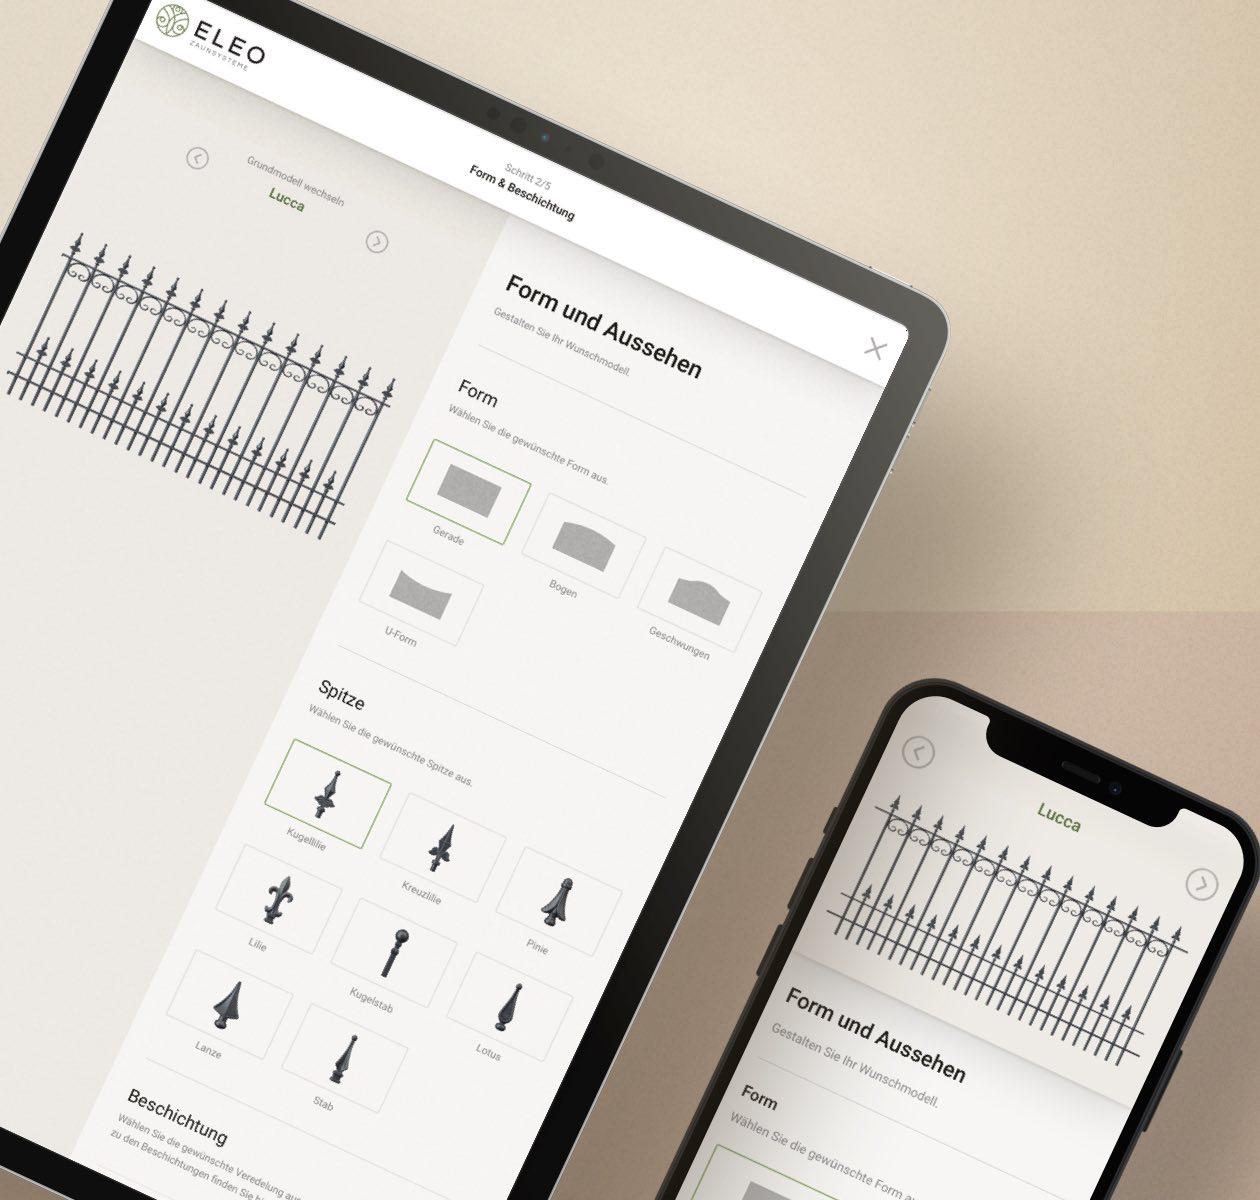 ELEO Zaun Konfigurator in einem iPad und iPhone Mockup